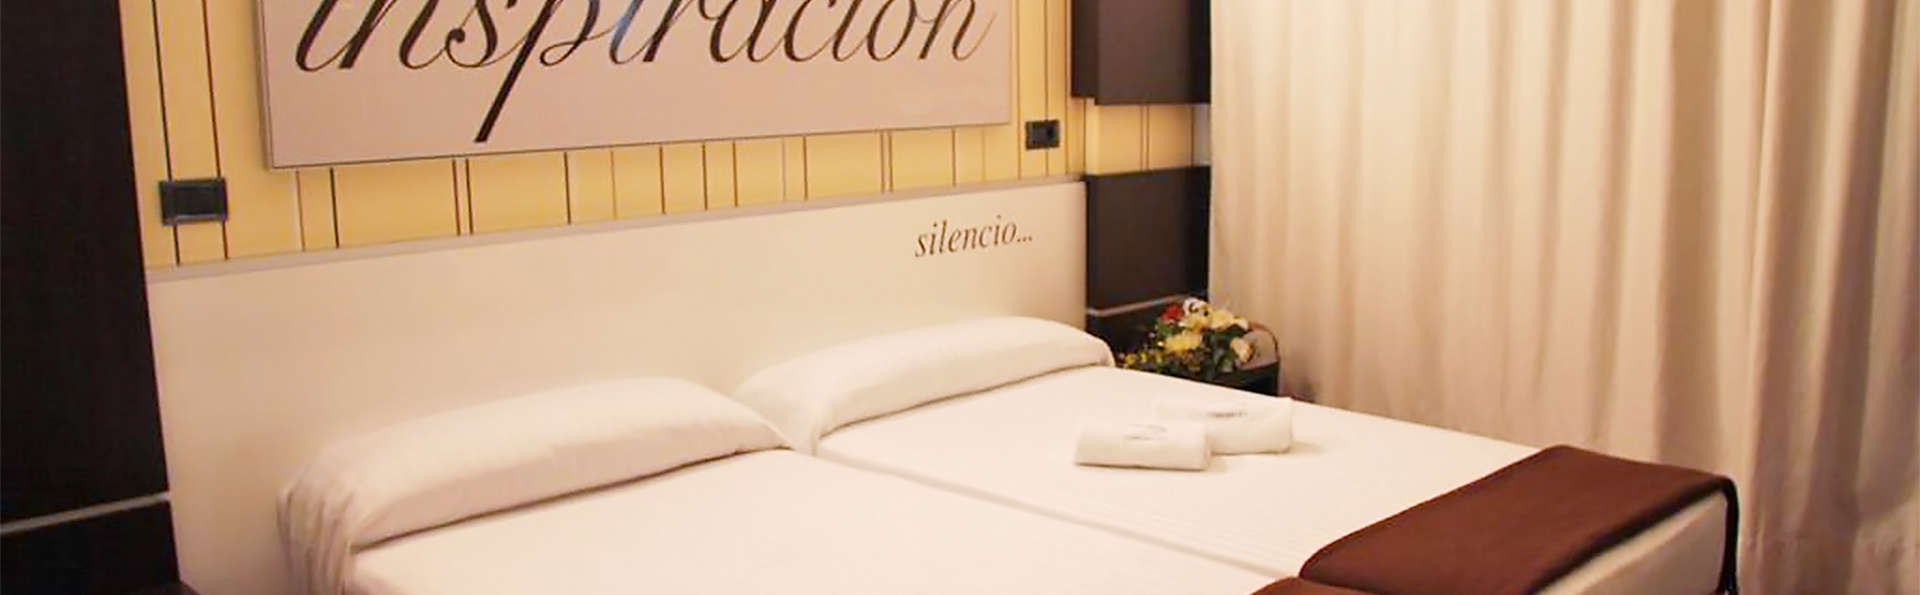 Hotel Europa - EDIT_room1.jpg